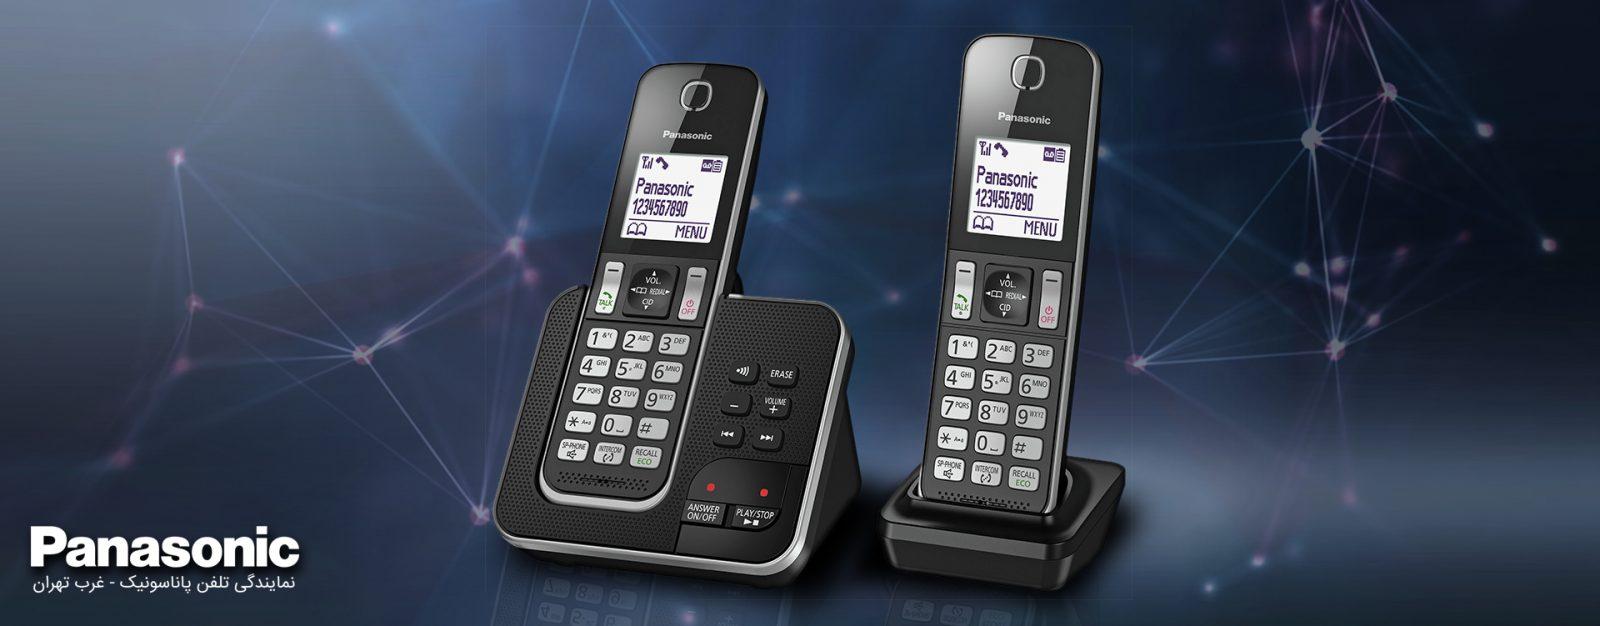 بنر فروش تلفن های پاناسونیک